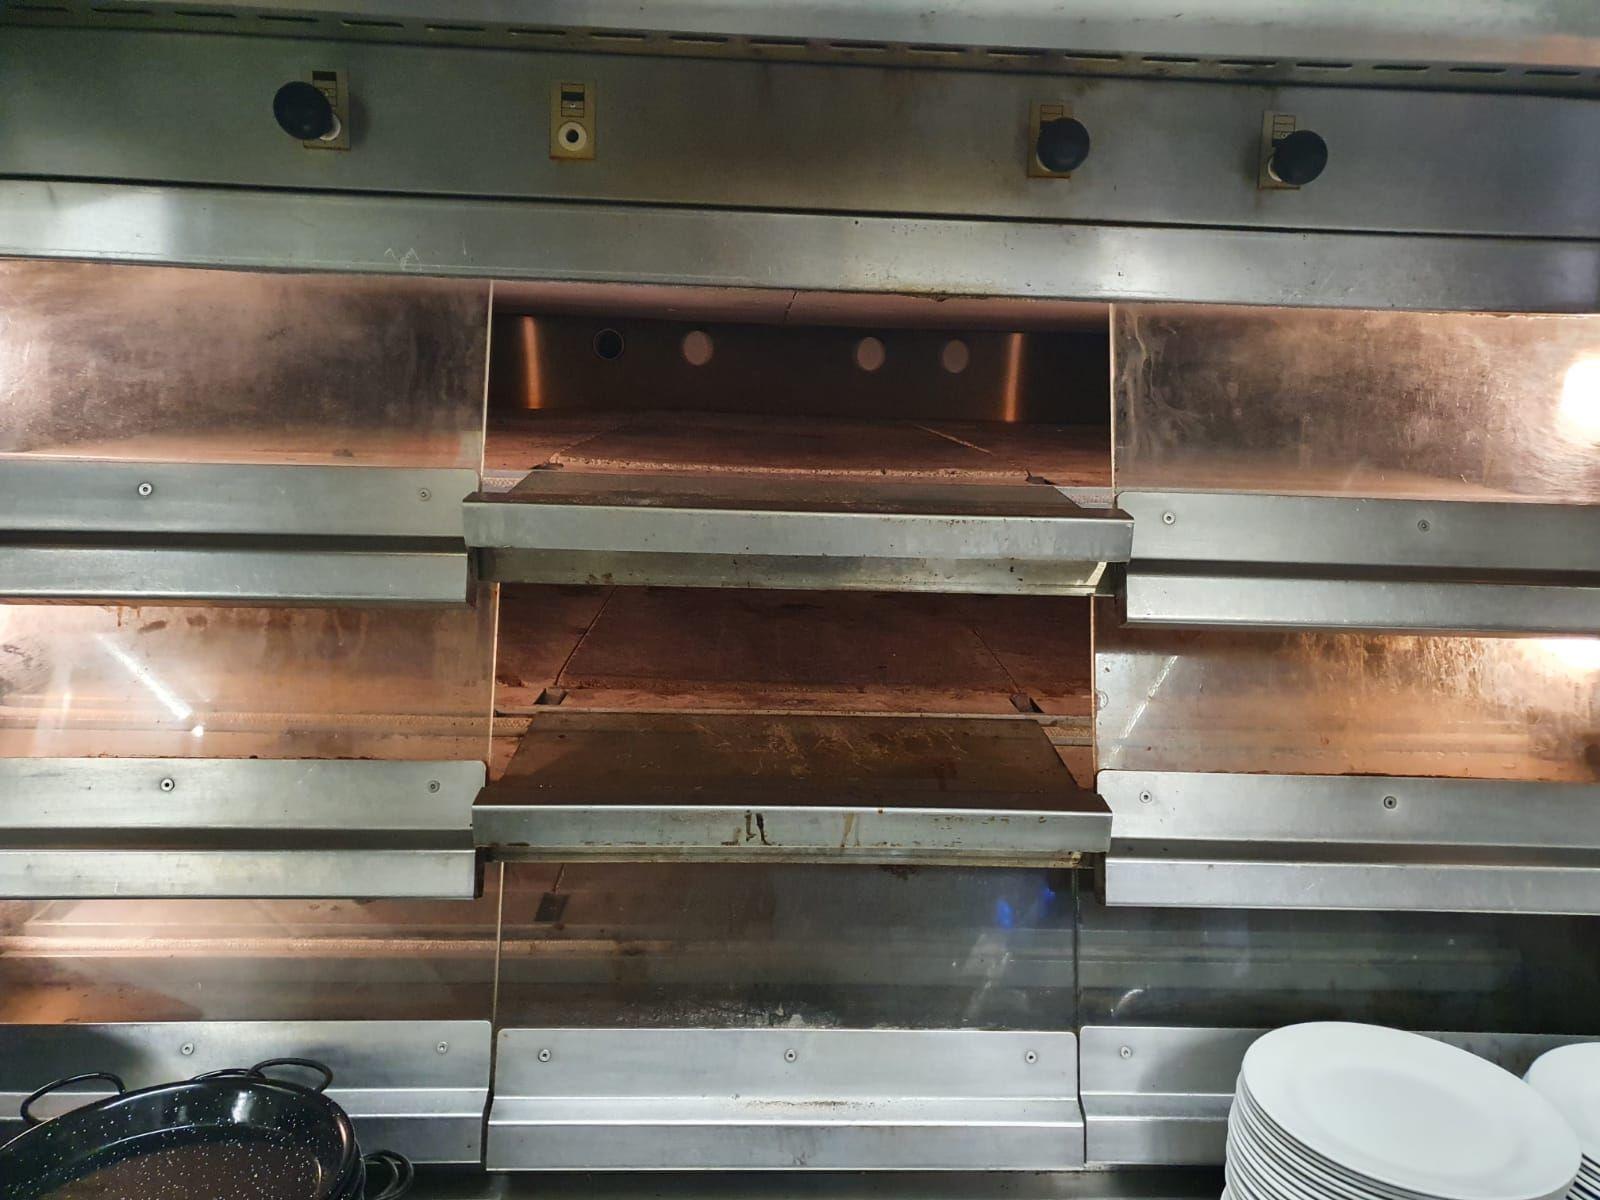 Nuestro horno paellero